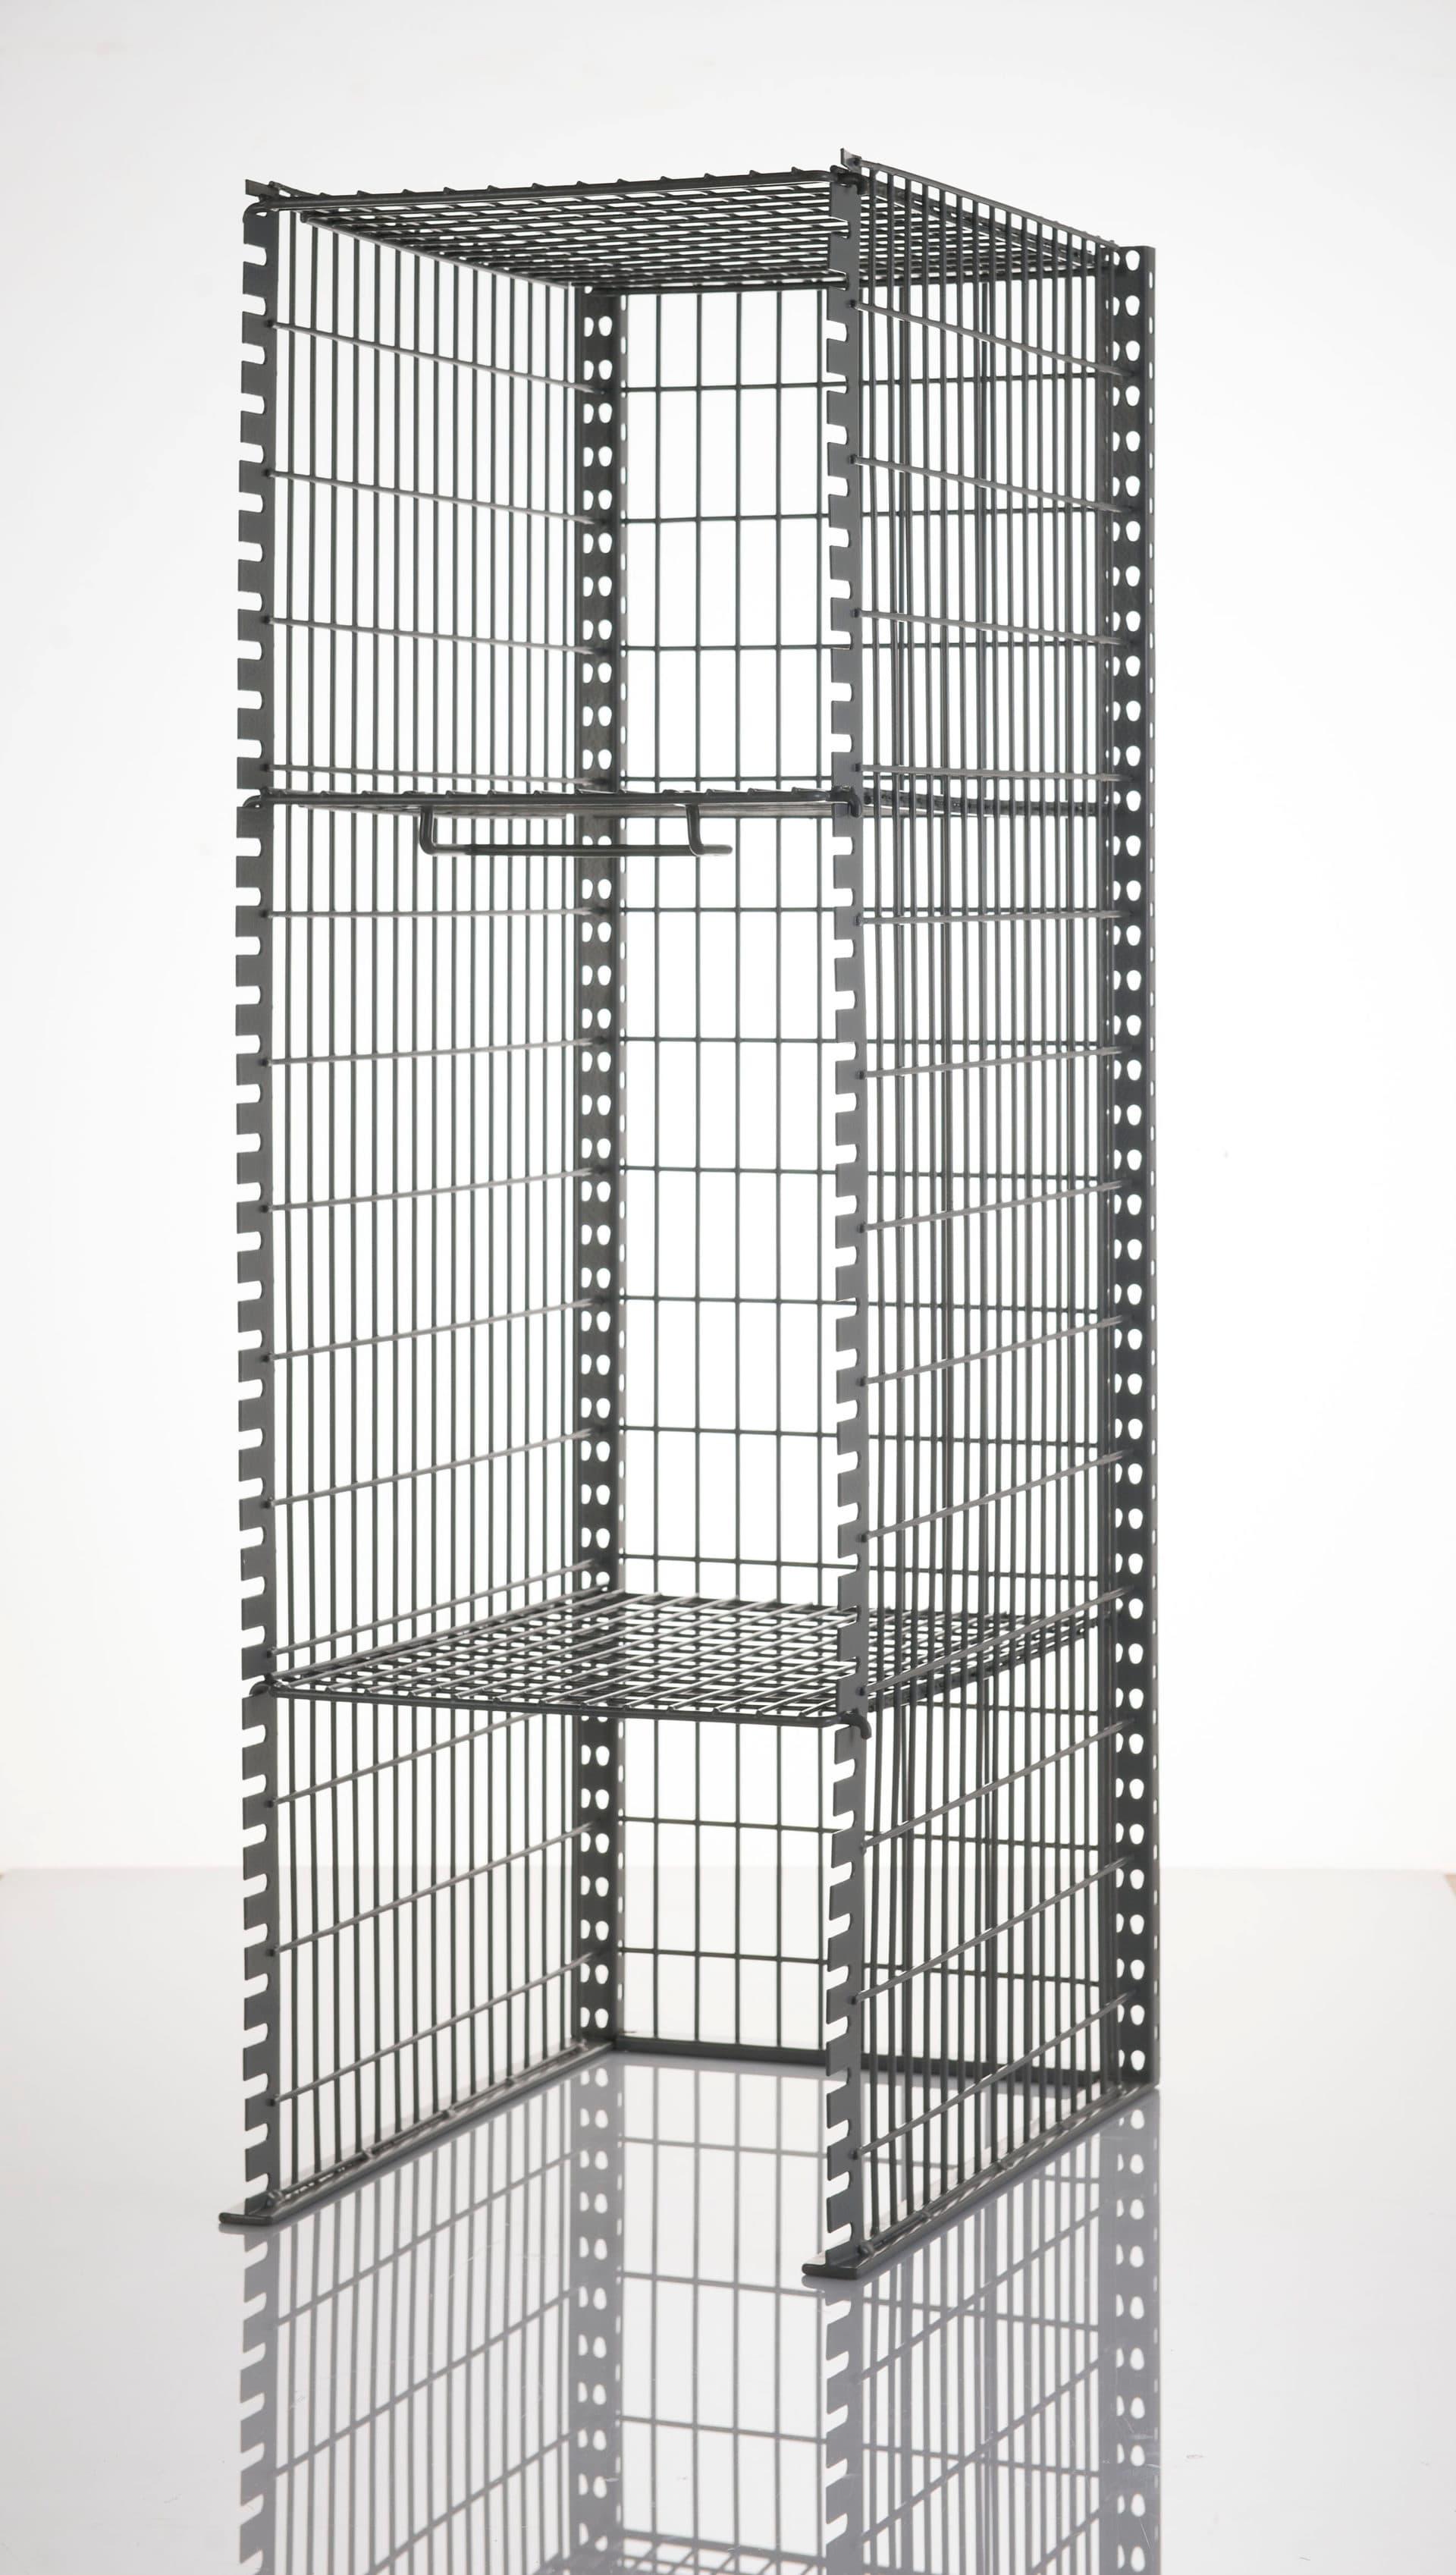 Imagen casilleros modulares en parrilla de acero